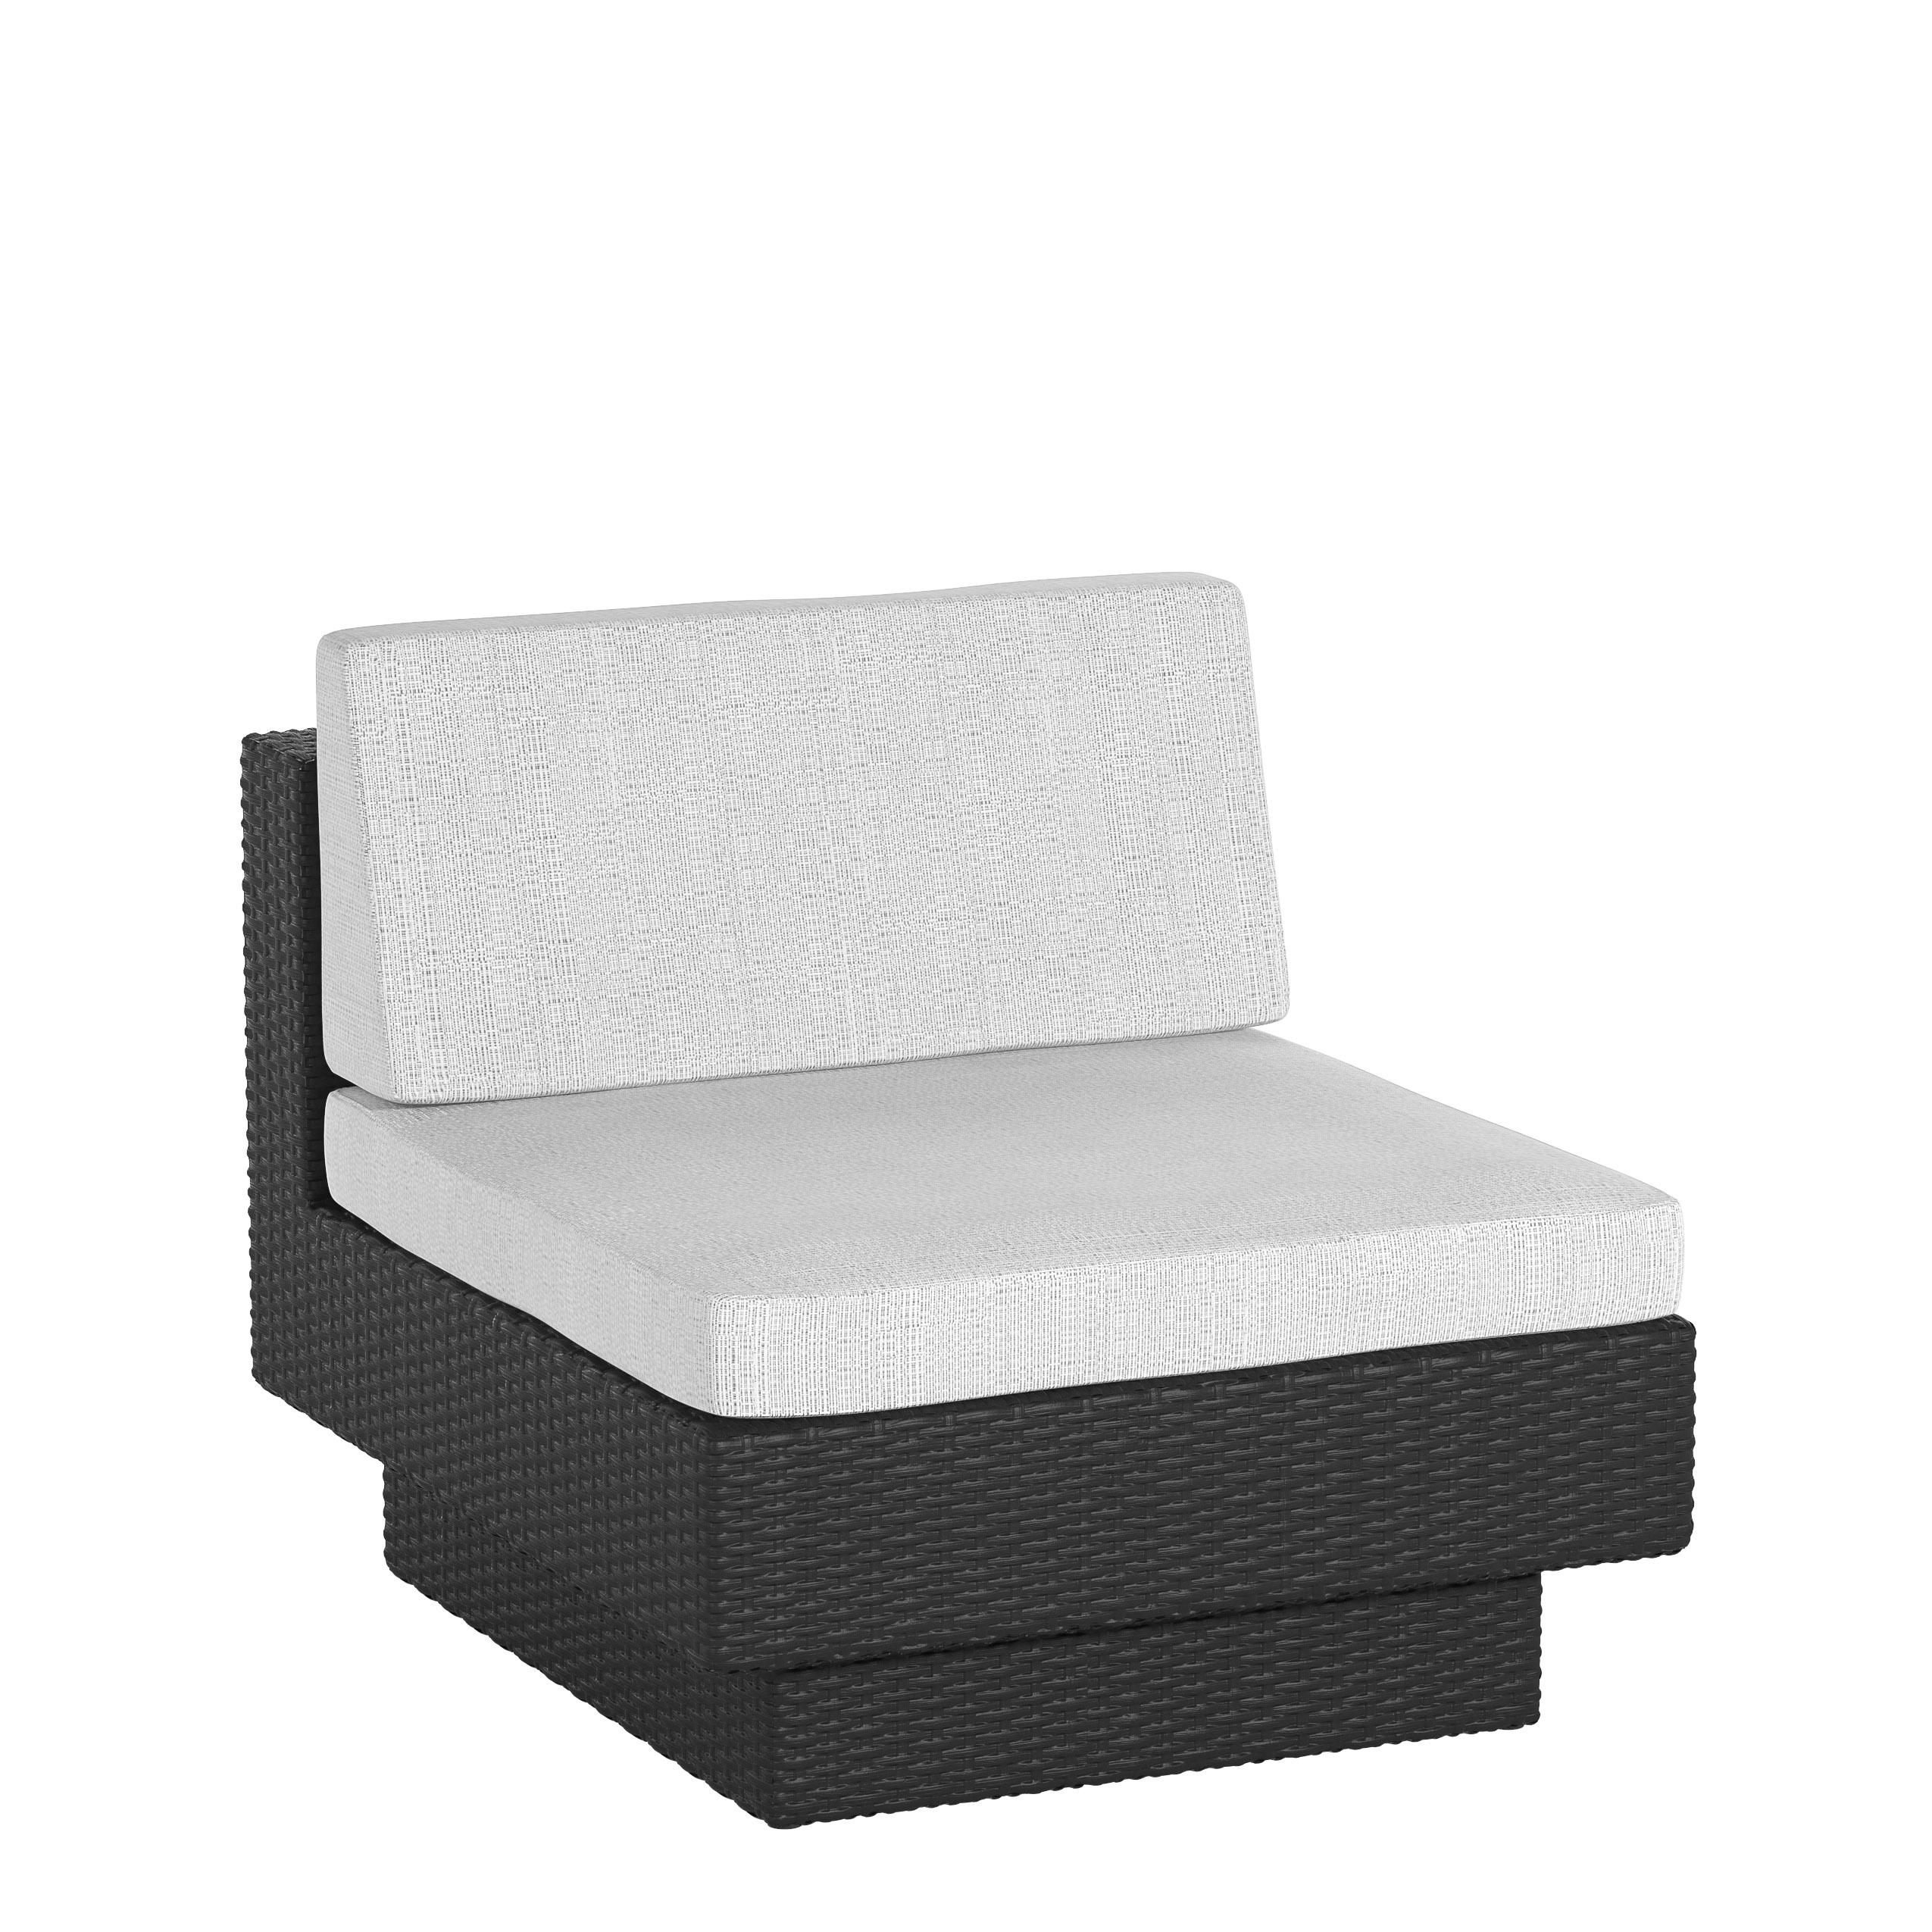 Sonax Park Terrace Textured Black Patio Middle Seat